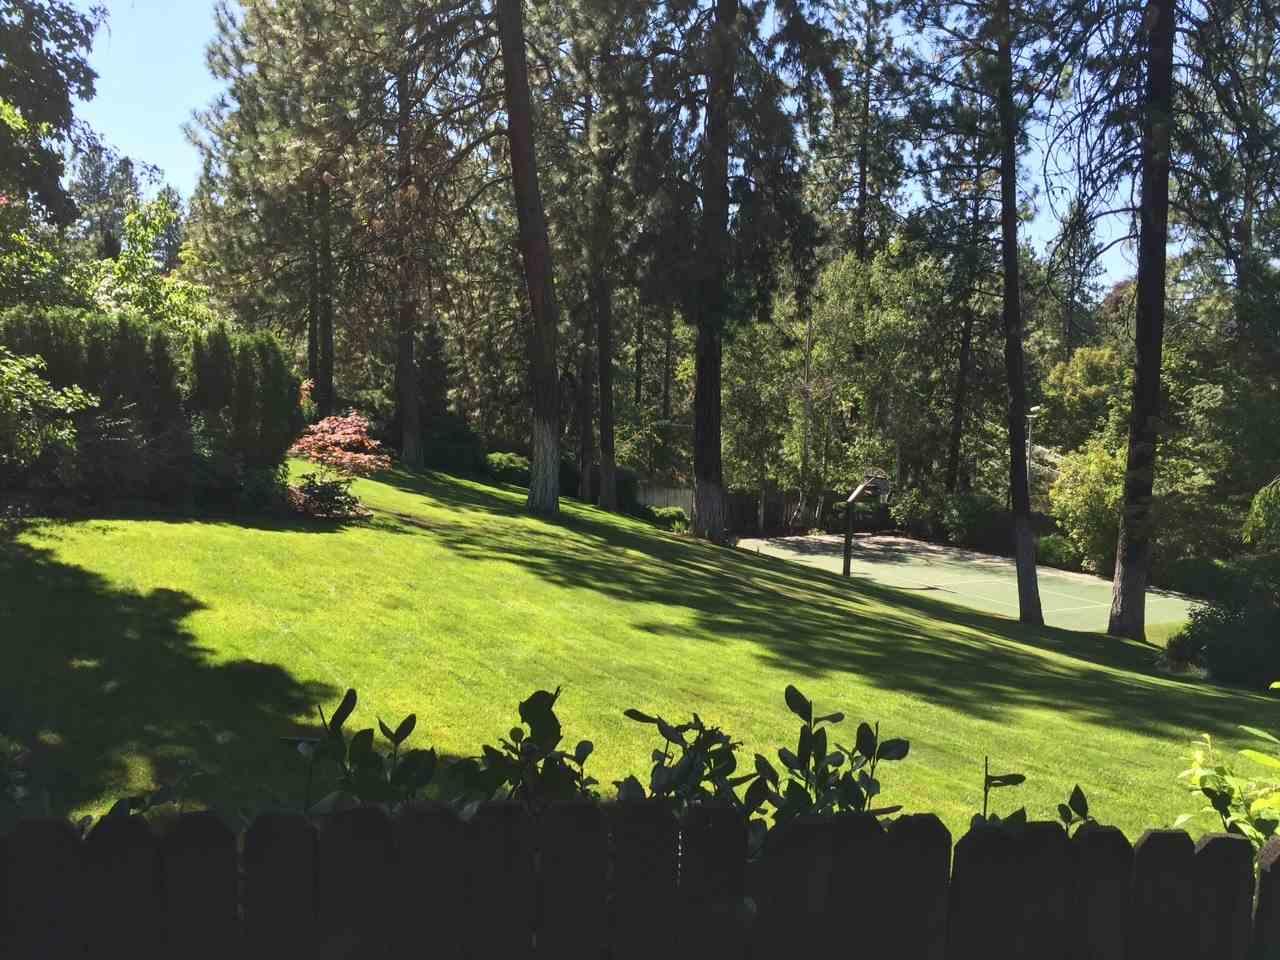 1606 S Crest Hill Dr , Spokane, WA - USA (photo 4)